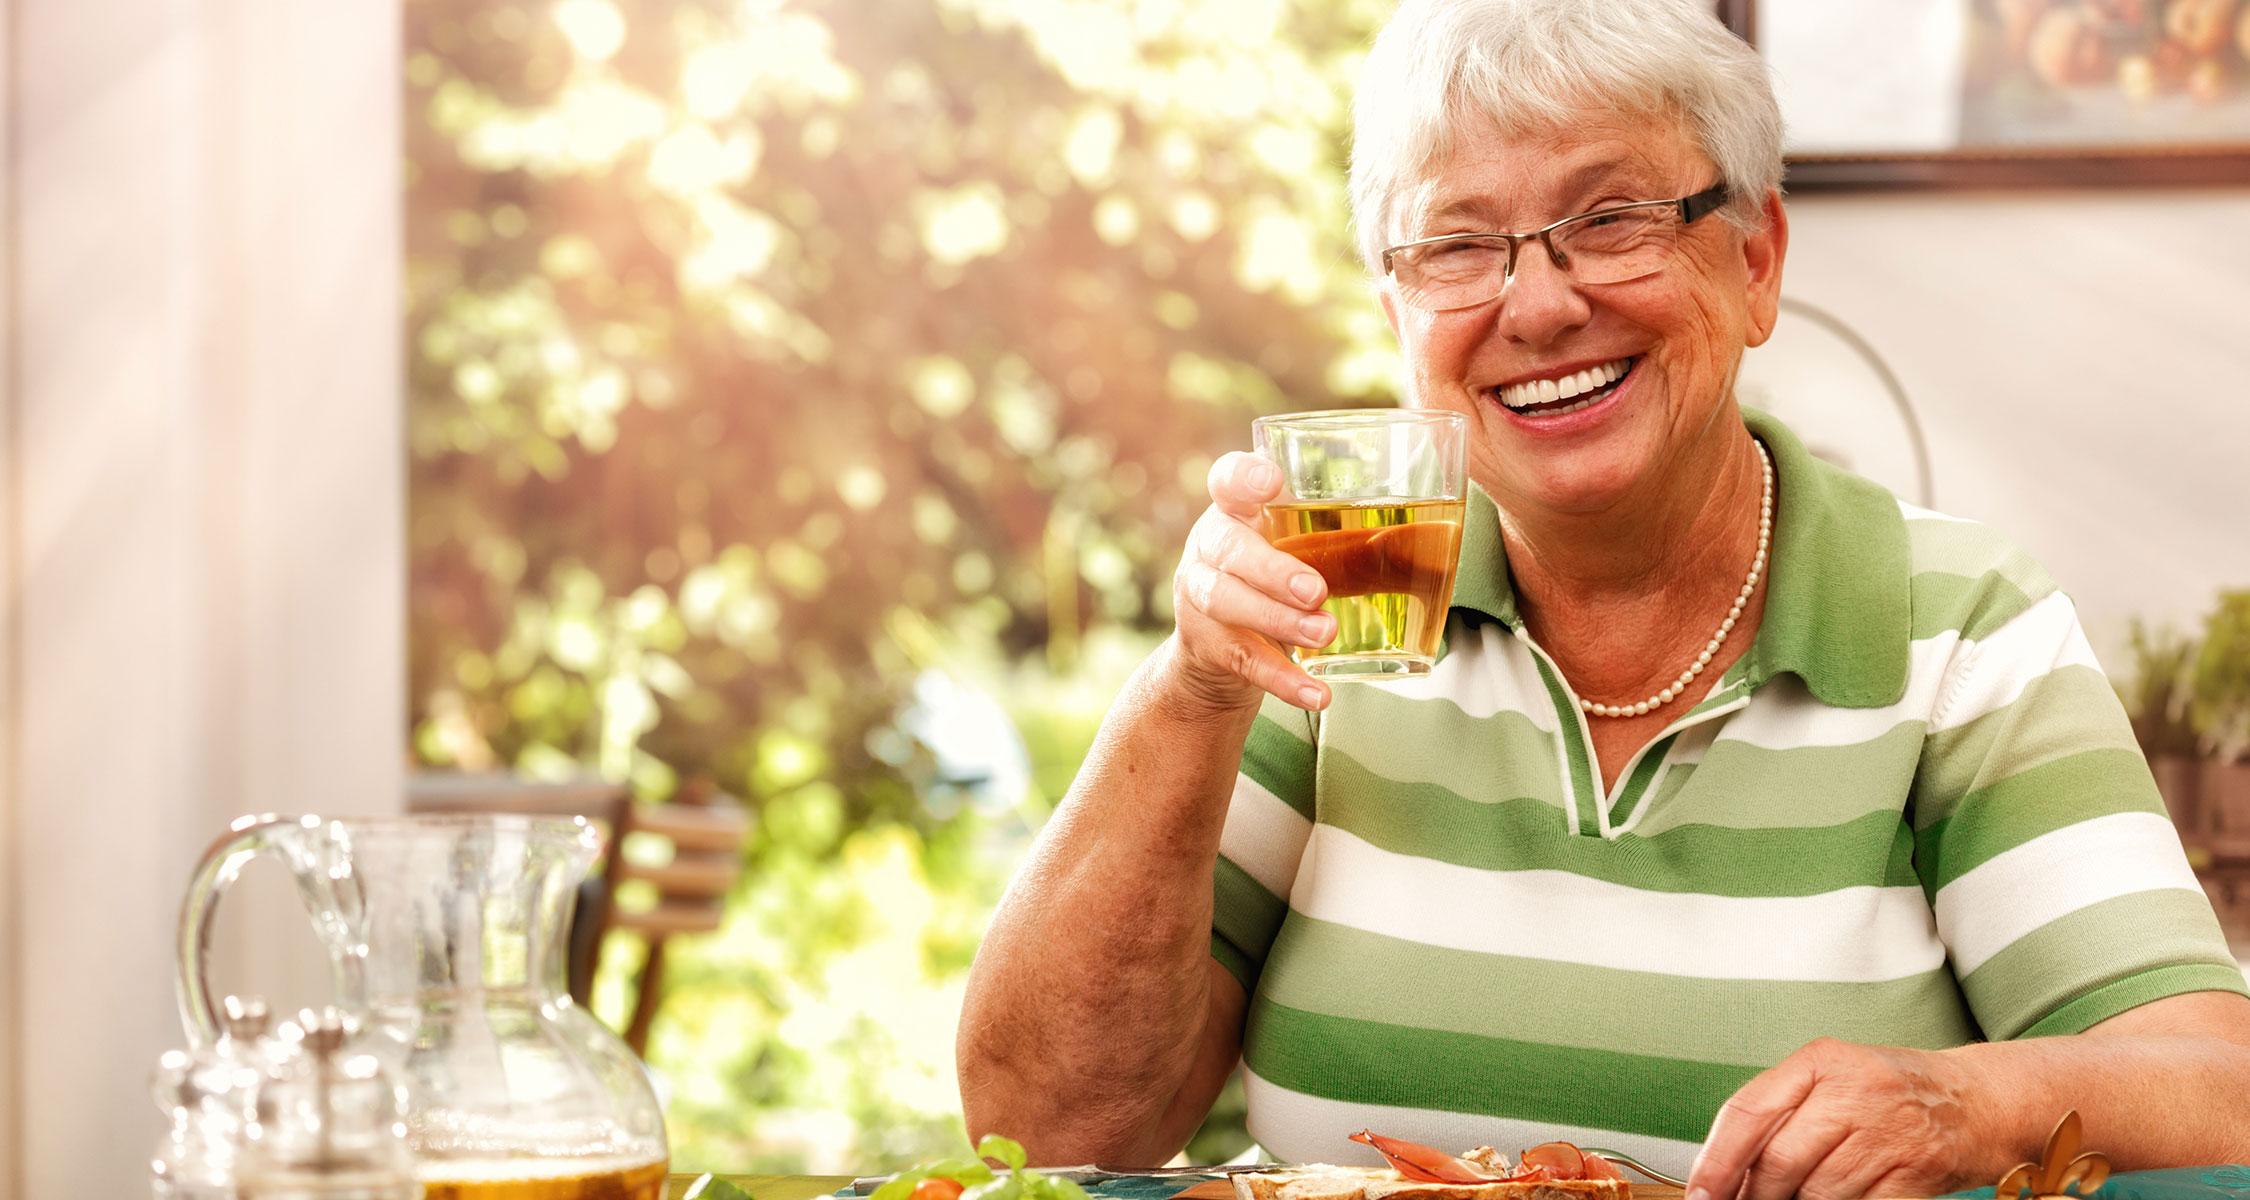 adult care - enjoying cup of tea